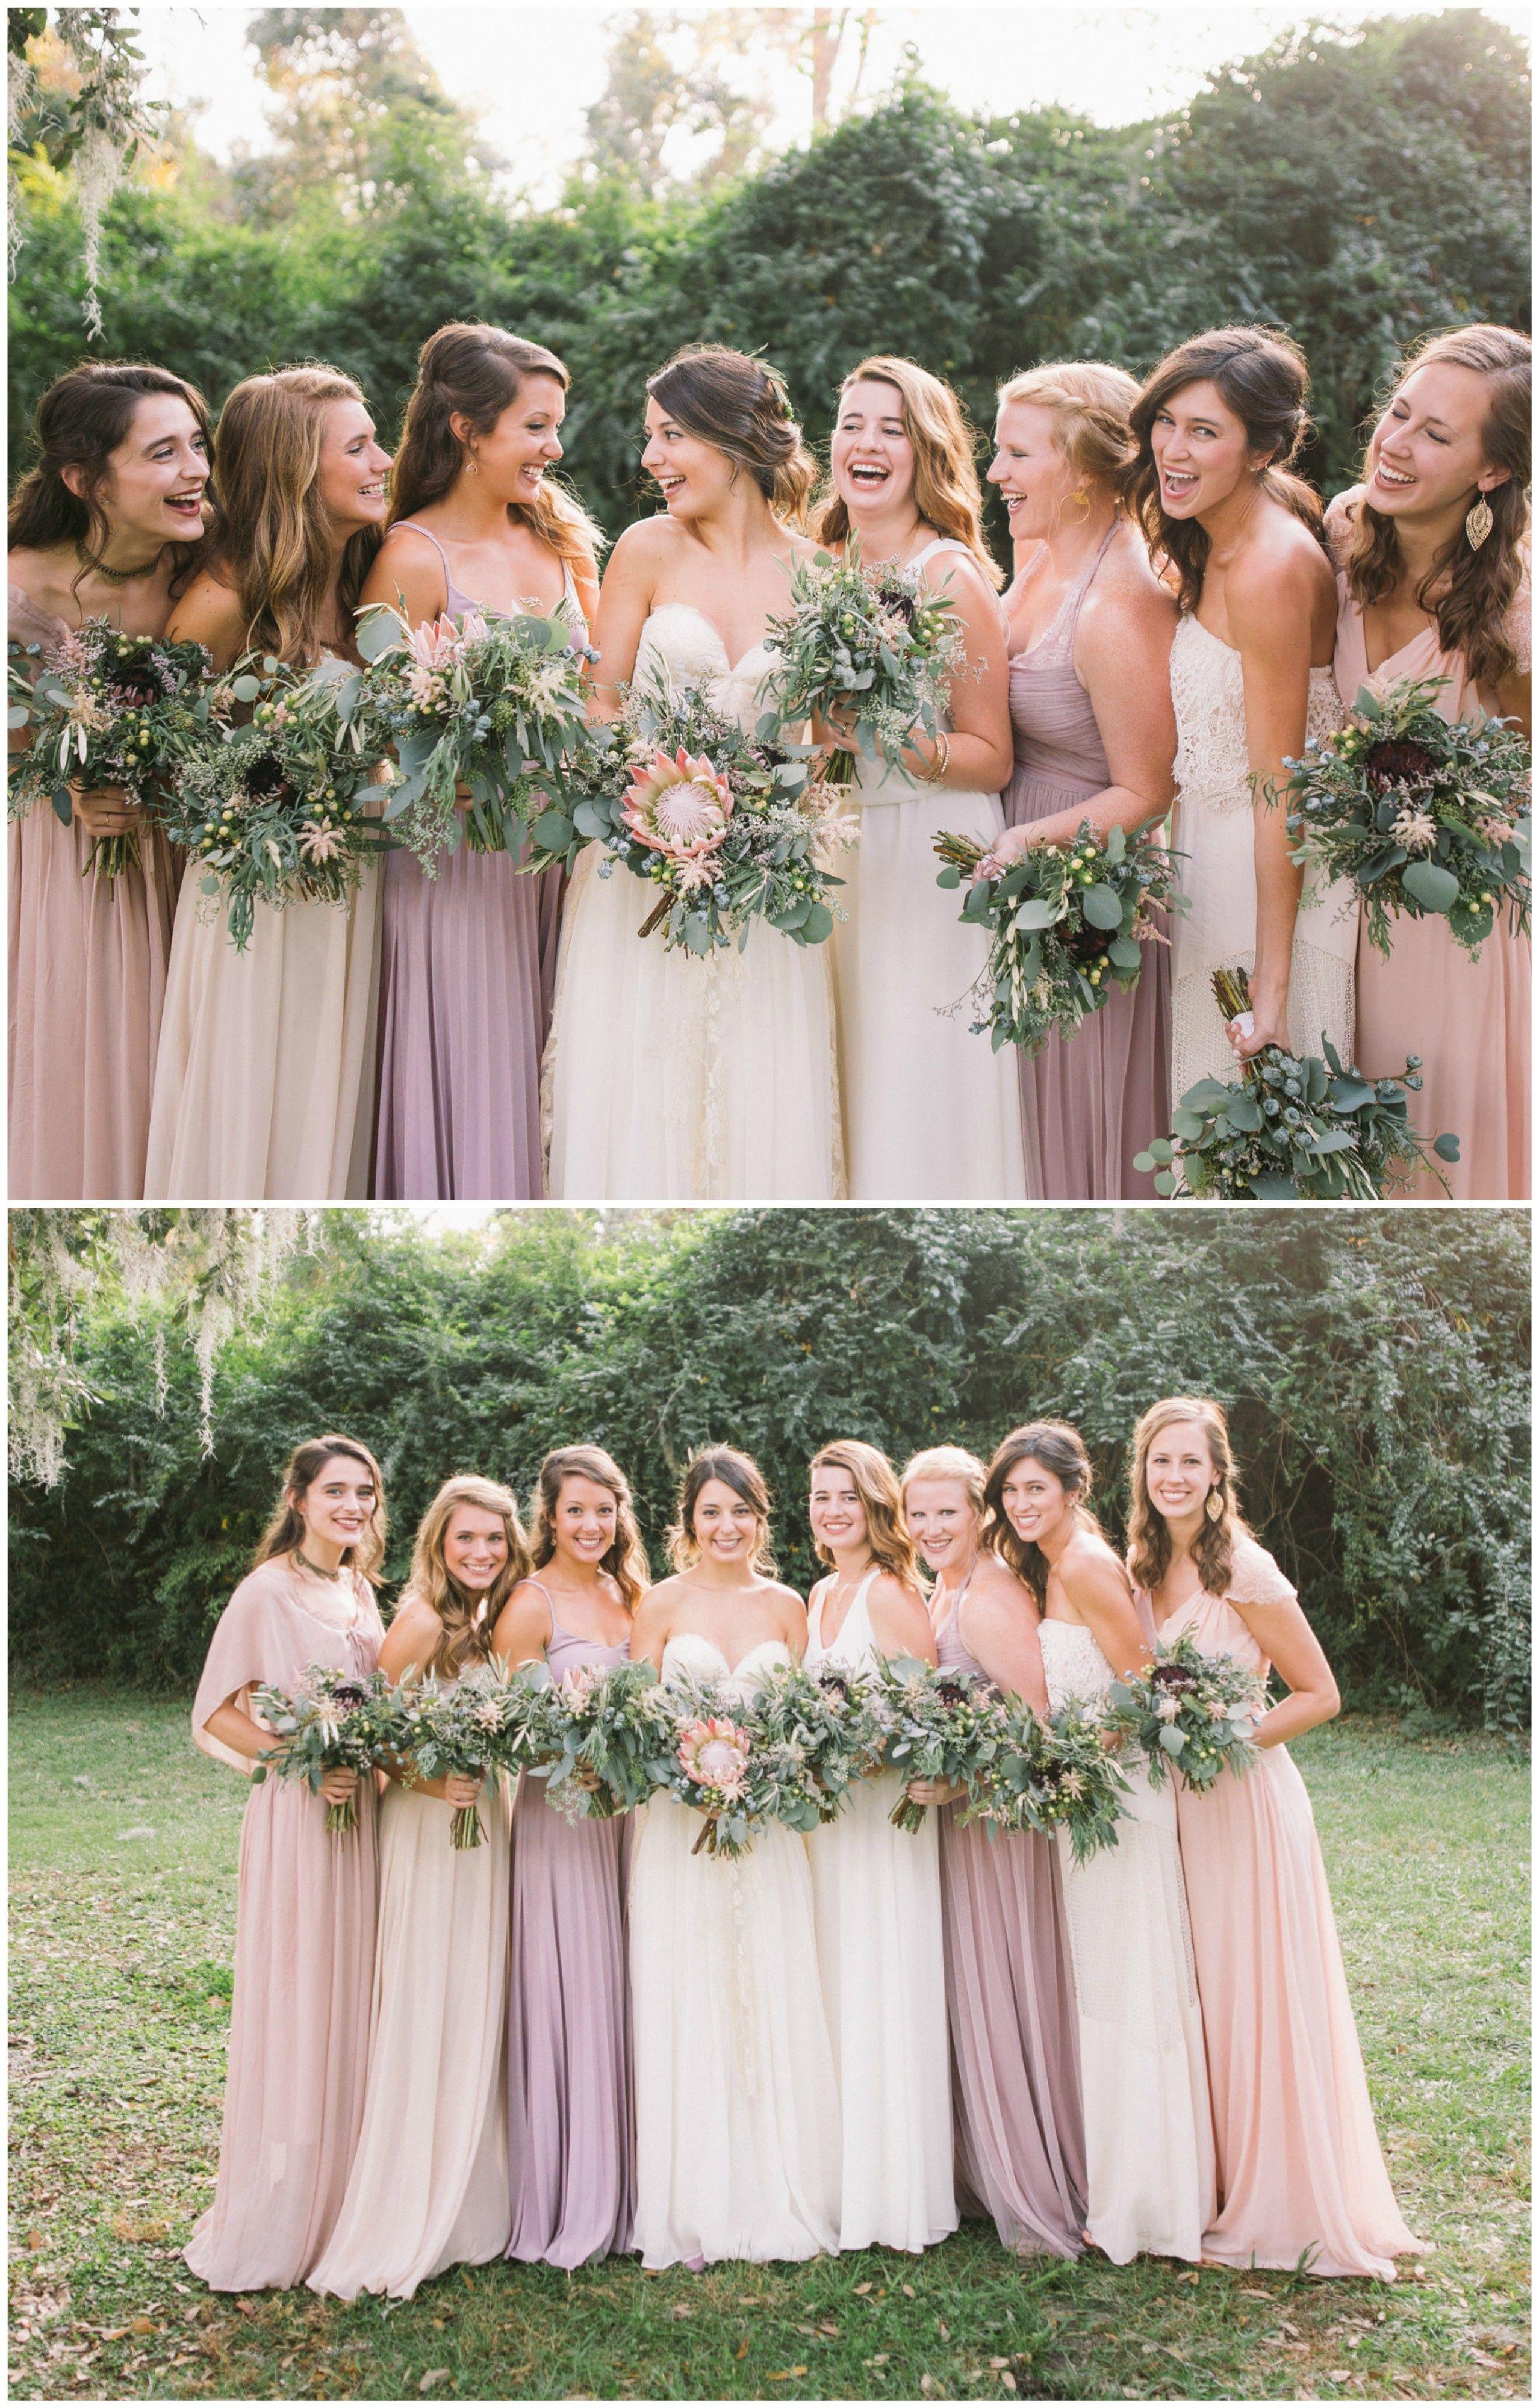 Bridesmaid fashion, leafy wedding bouquets, blush colored